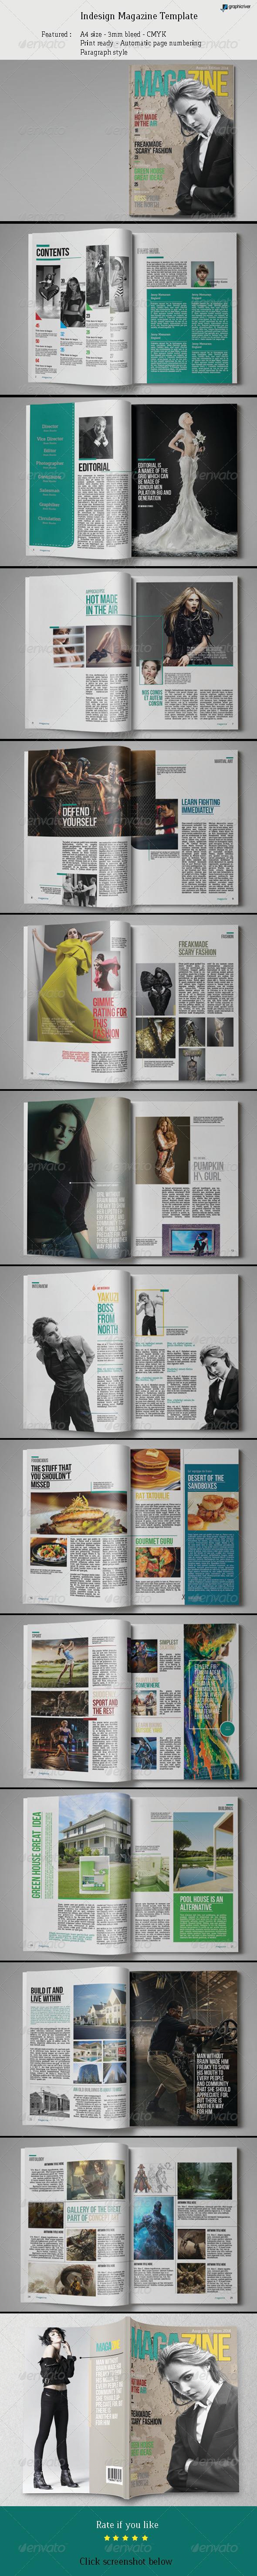 GraphicRiver Indesign Magazine Template 03 7967461